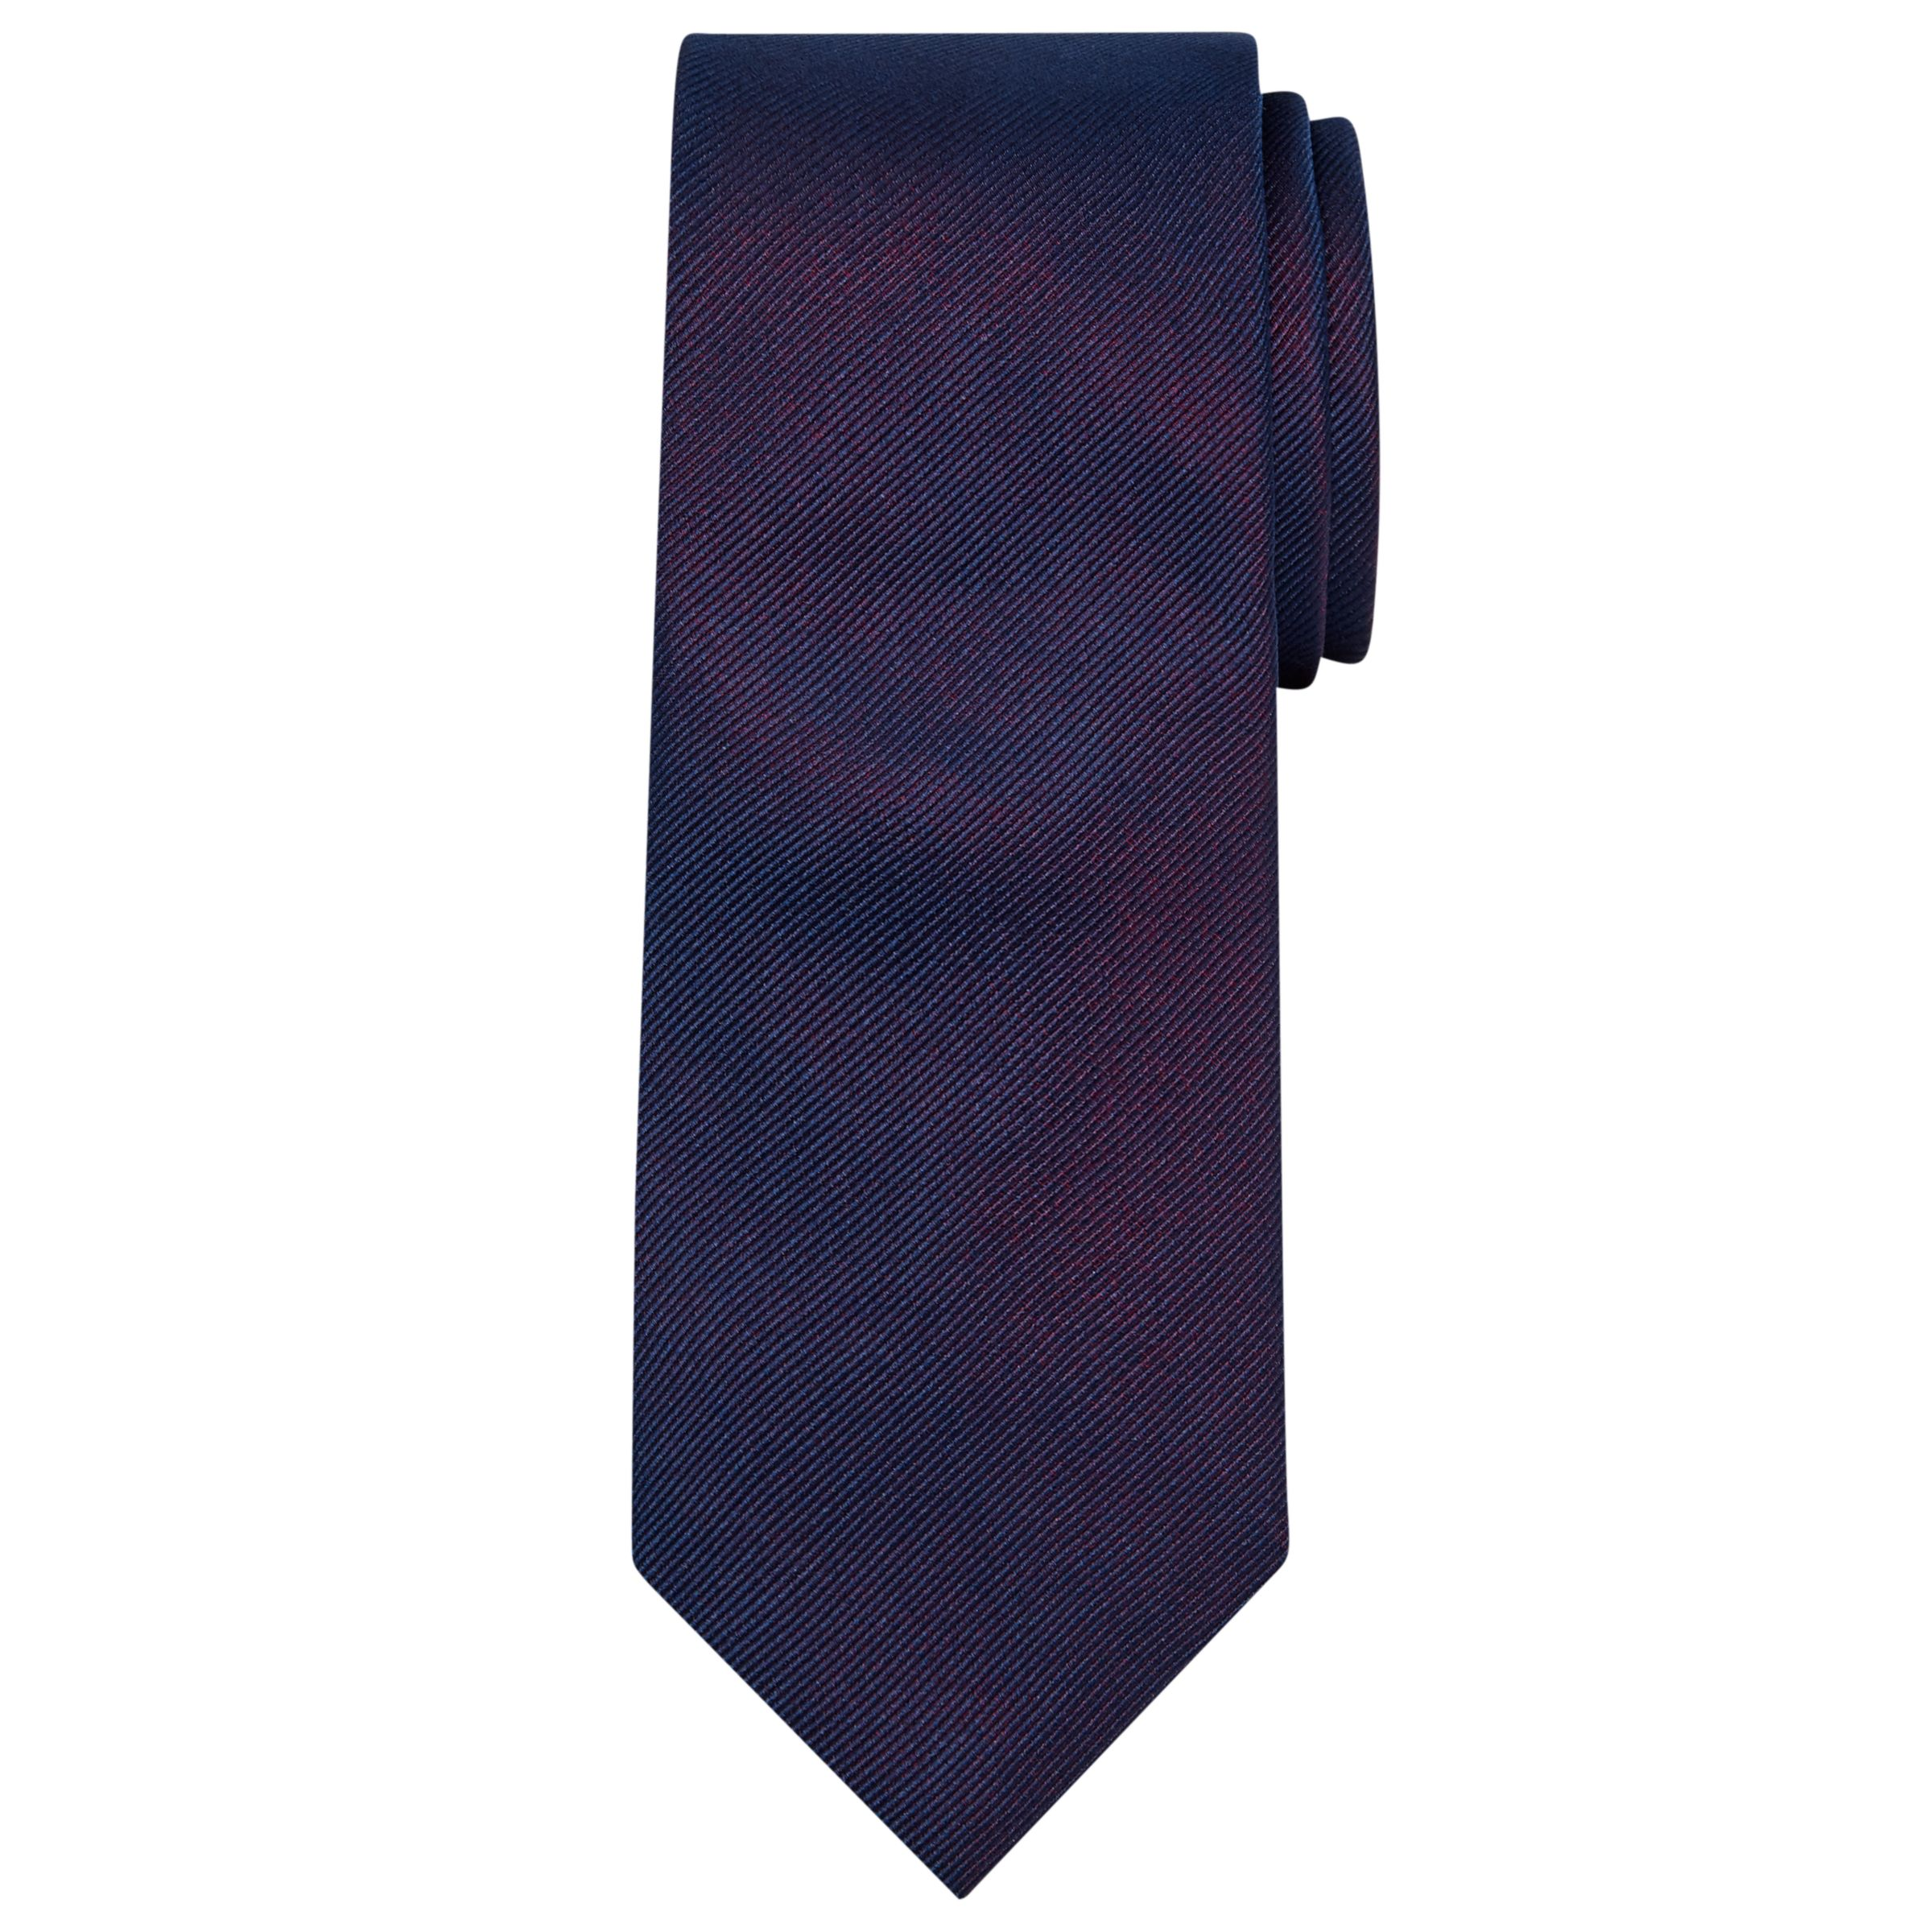 Richard James Mayfair Richard James Mayfair Plain Silk Tie, Purple